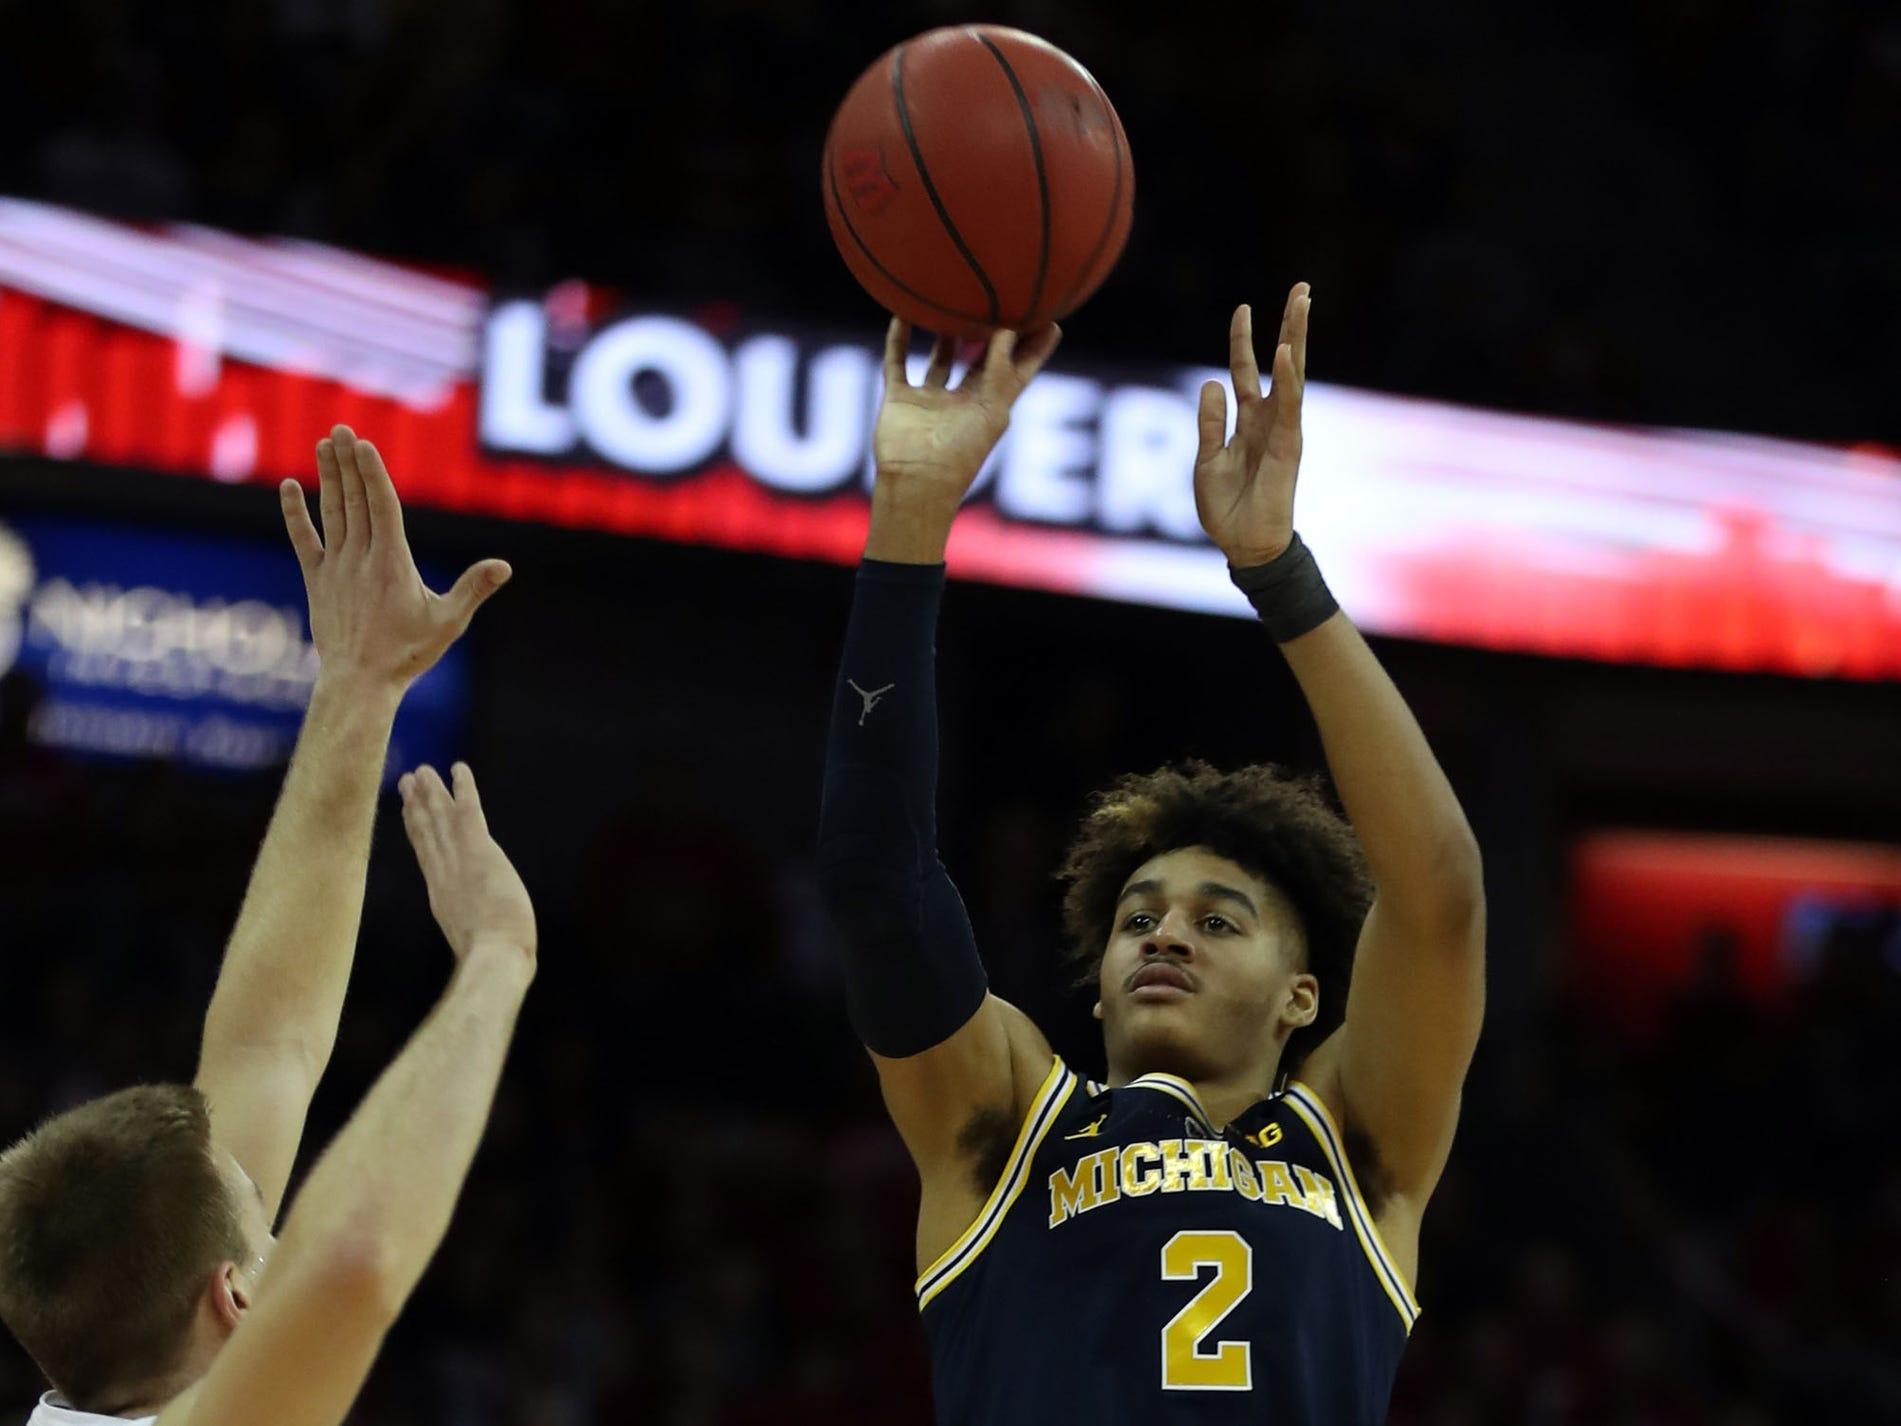 Michigan guard Jordan Poole shoots over Wisconsin guard Brad Davison at the Kohl Center, Jan. 19, 2019 in Madison, Wisc.